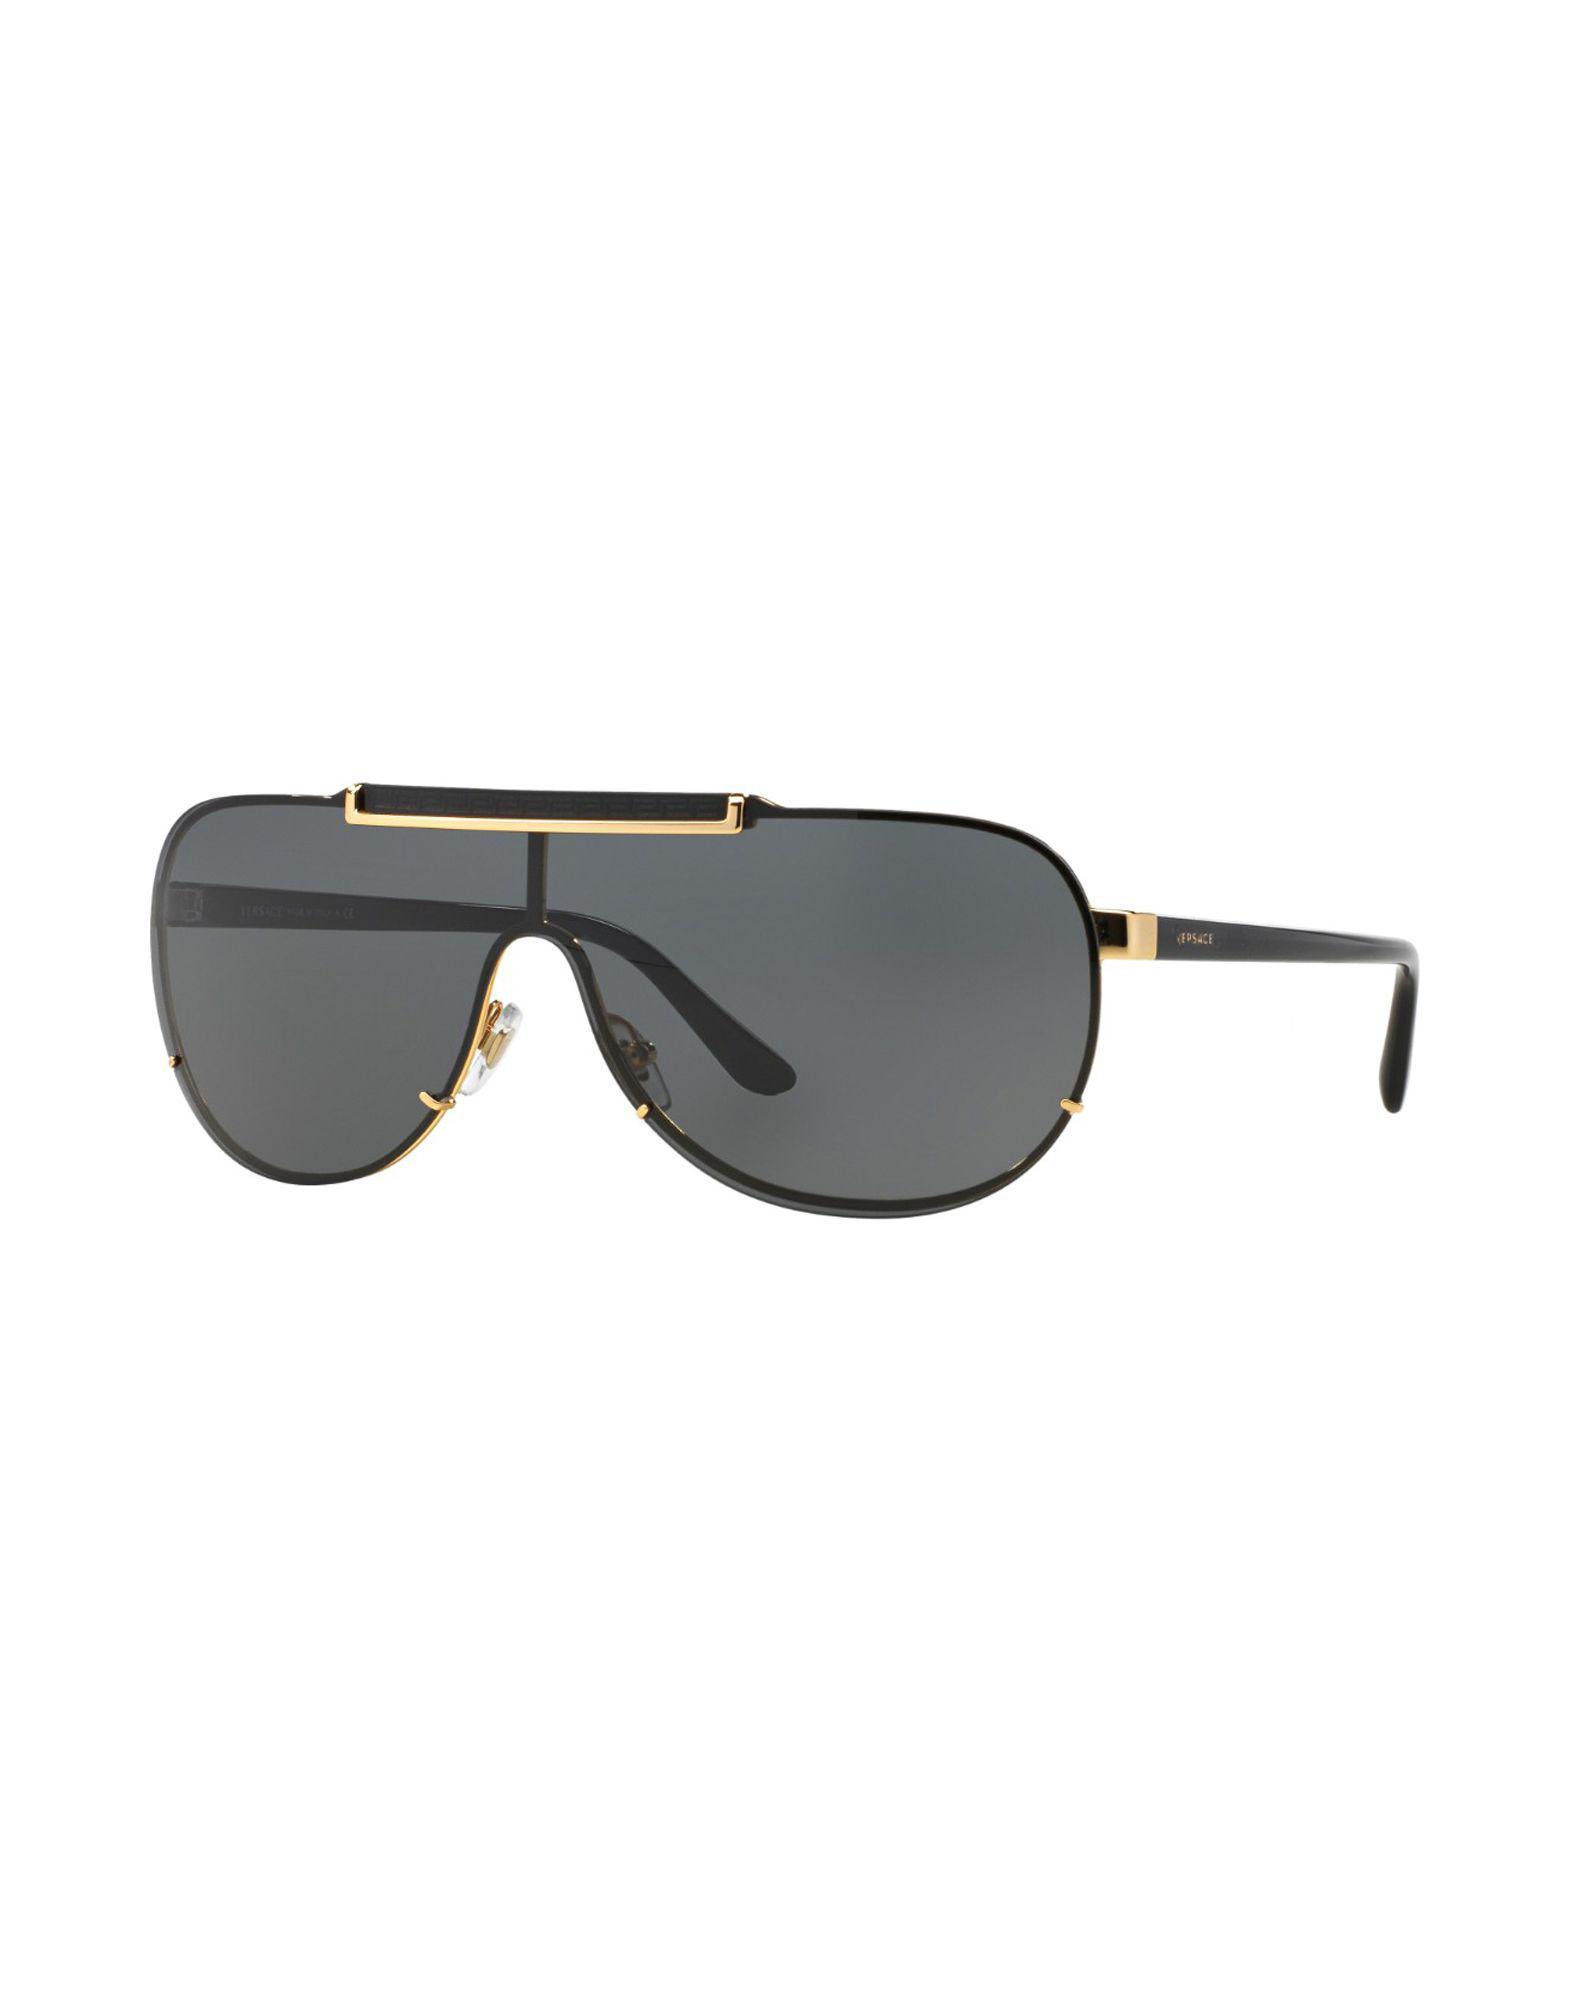 8111ca9cef Versace Sunglasses in Metallic for Men - Lyst